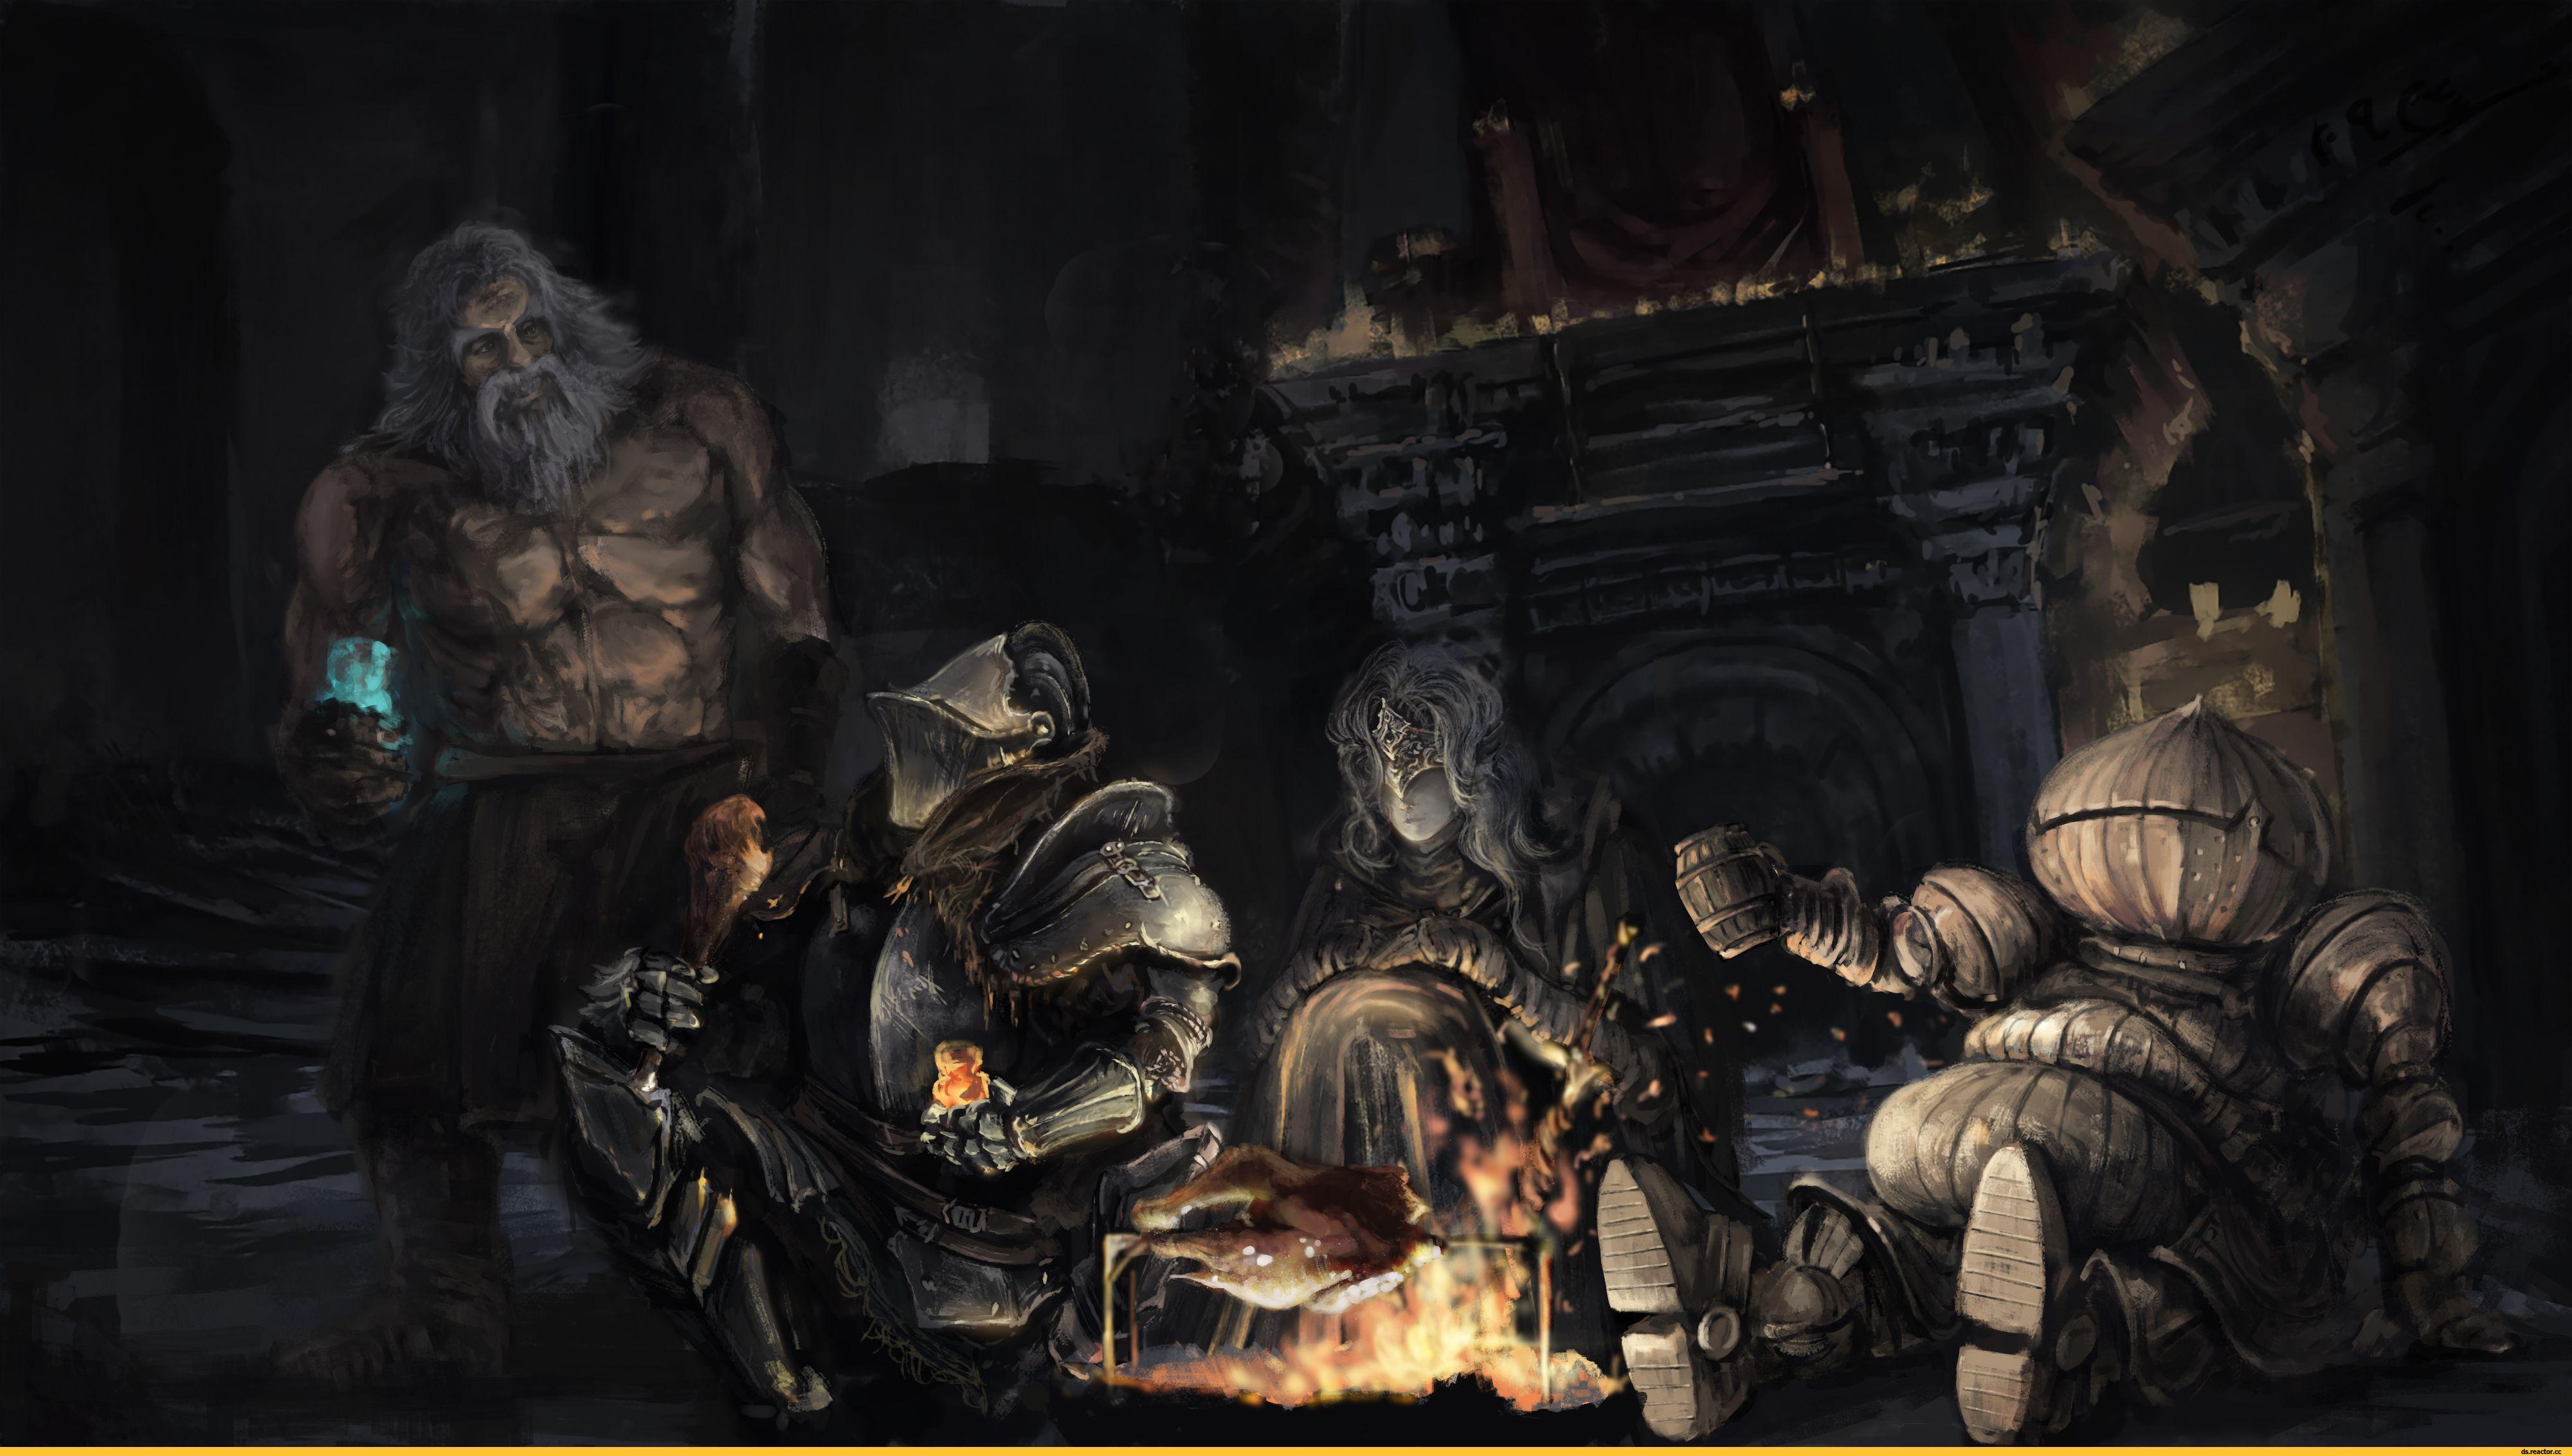 Andre Of Astora Ashen One Dsiii Personazhi Dark Souls 3 3851862